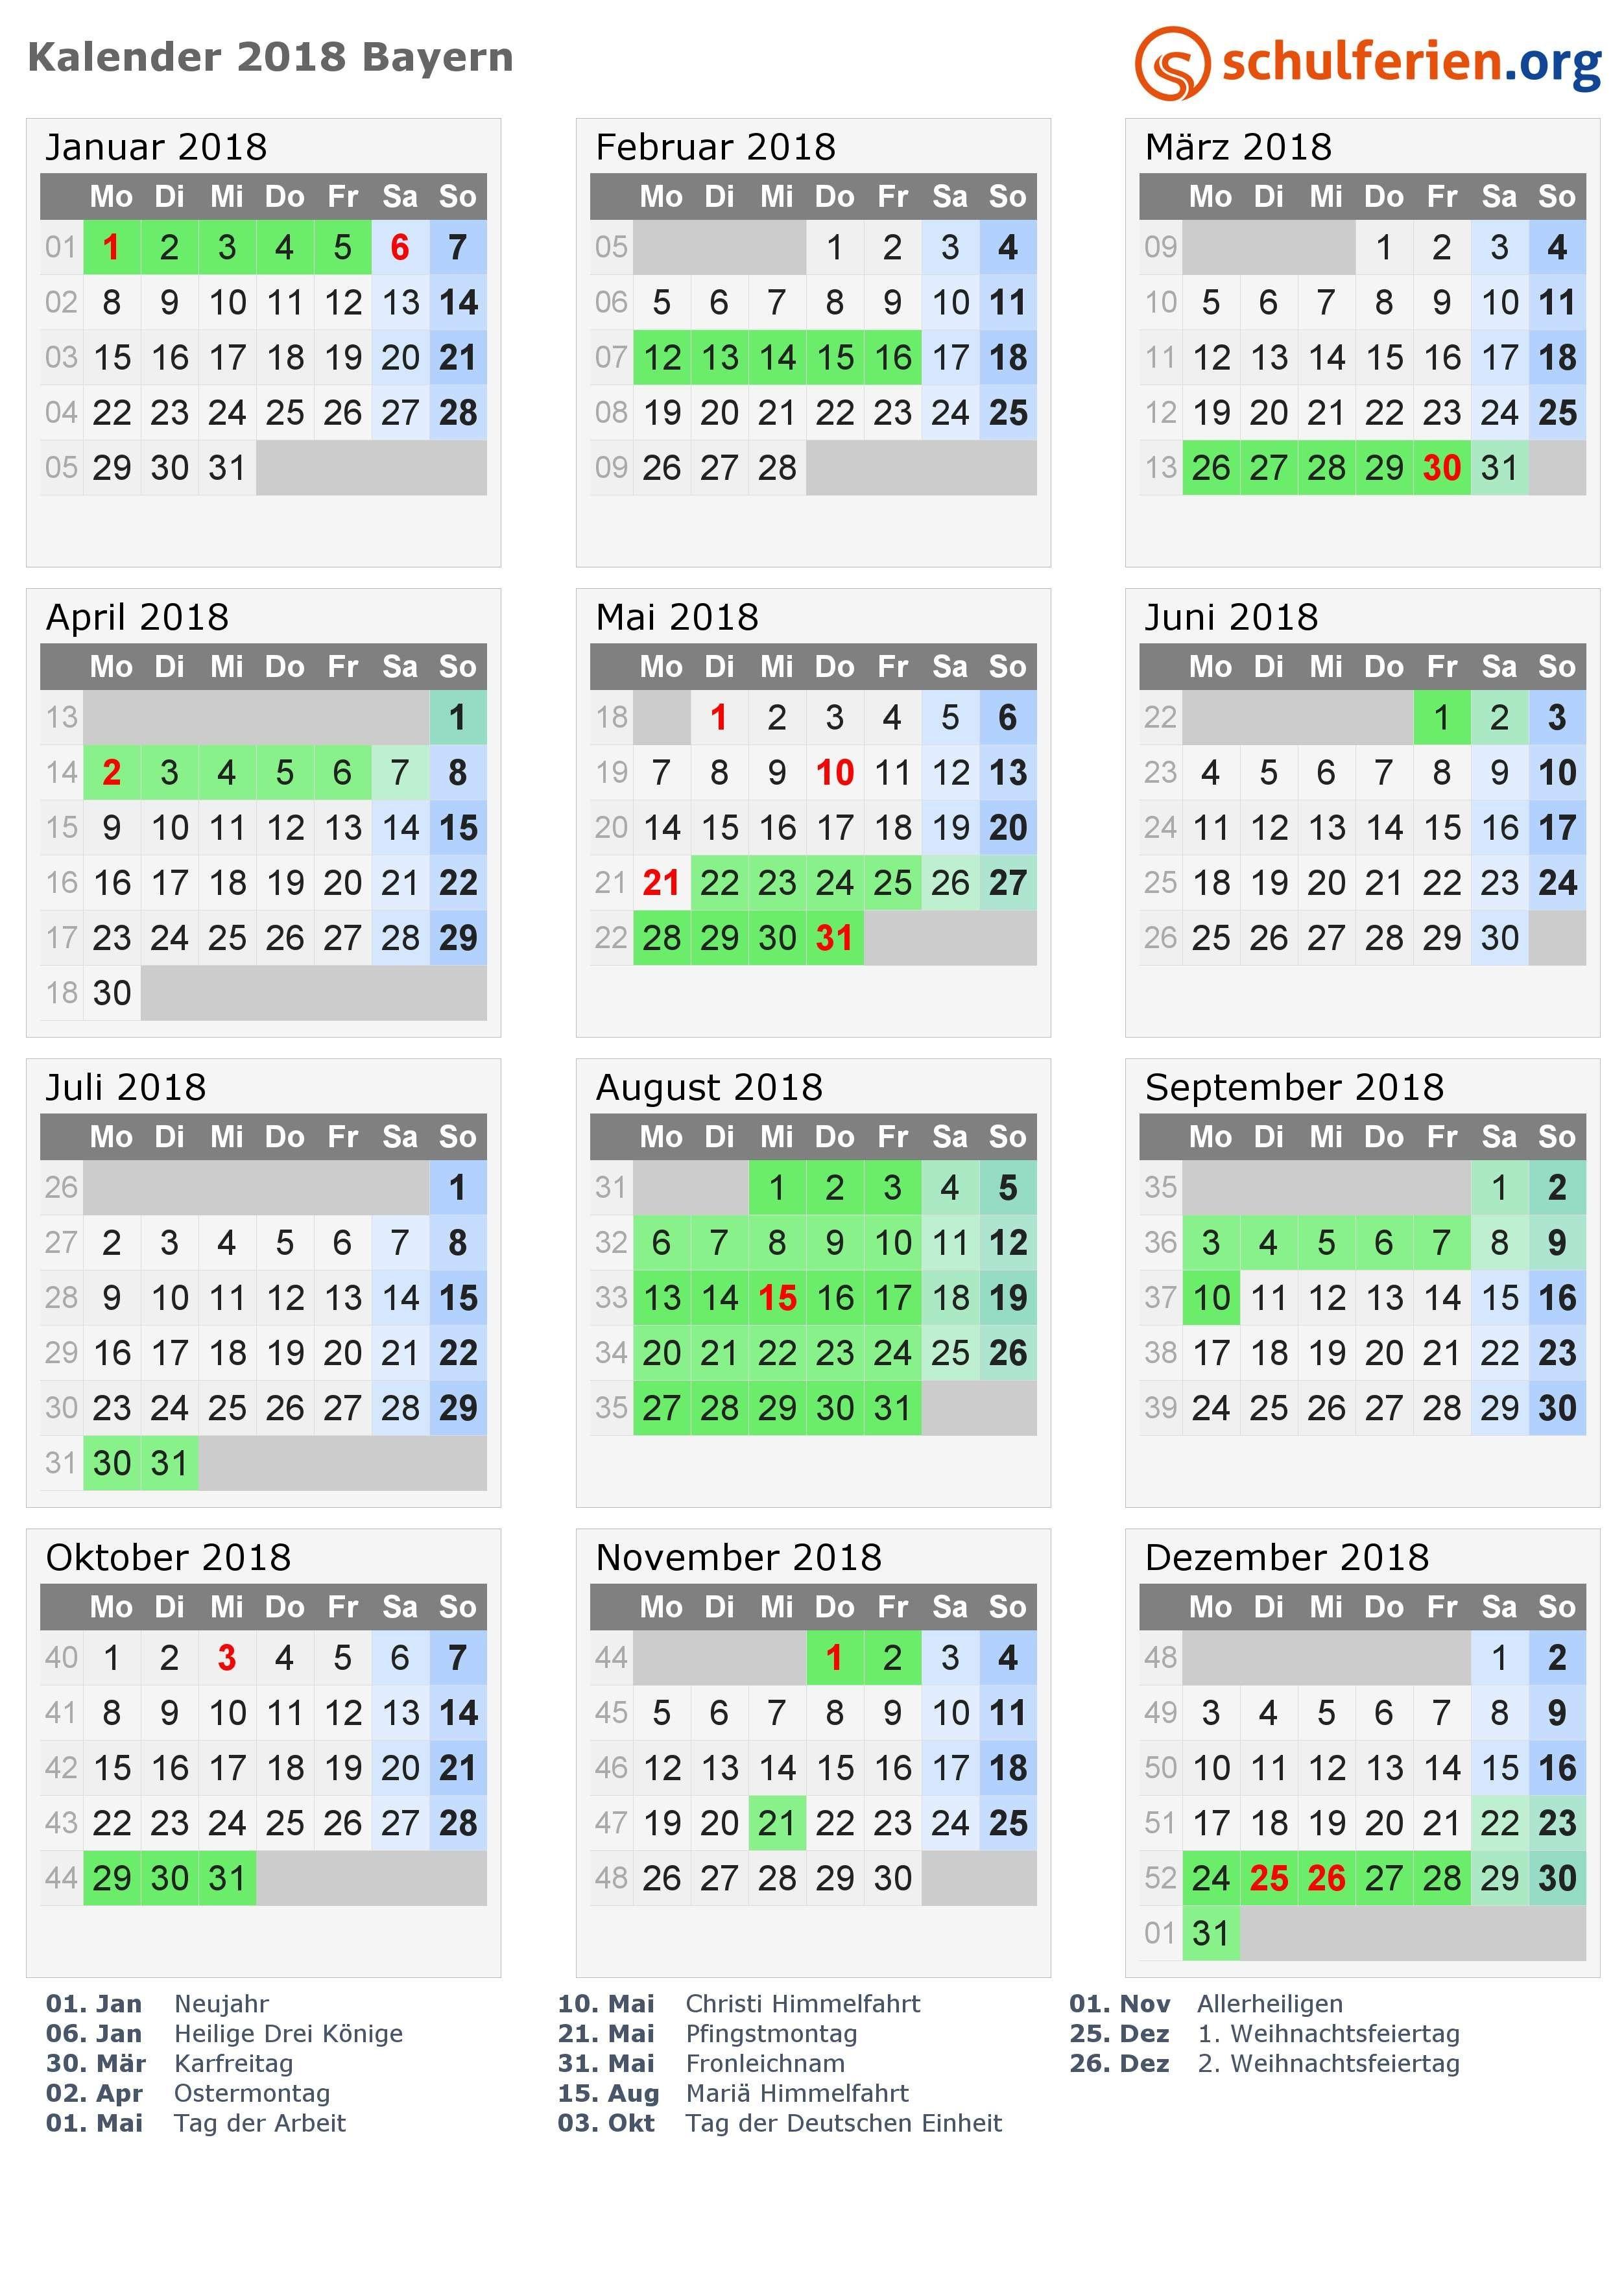 Kalender 2018 Ferien Bayern Feiertage Inspiration Von Ferien Weihnachten 2017 32 Elegant Ferien Weihnachten 2017